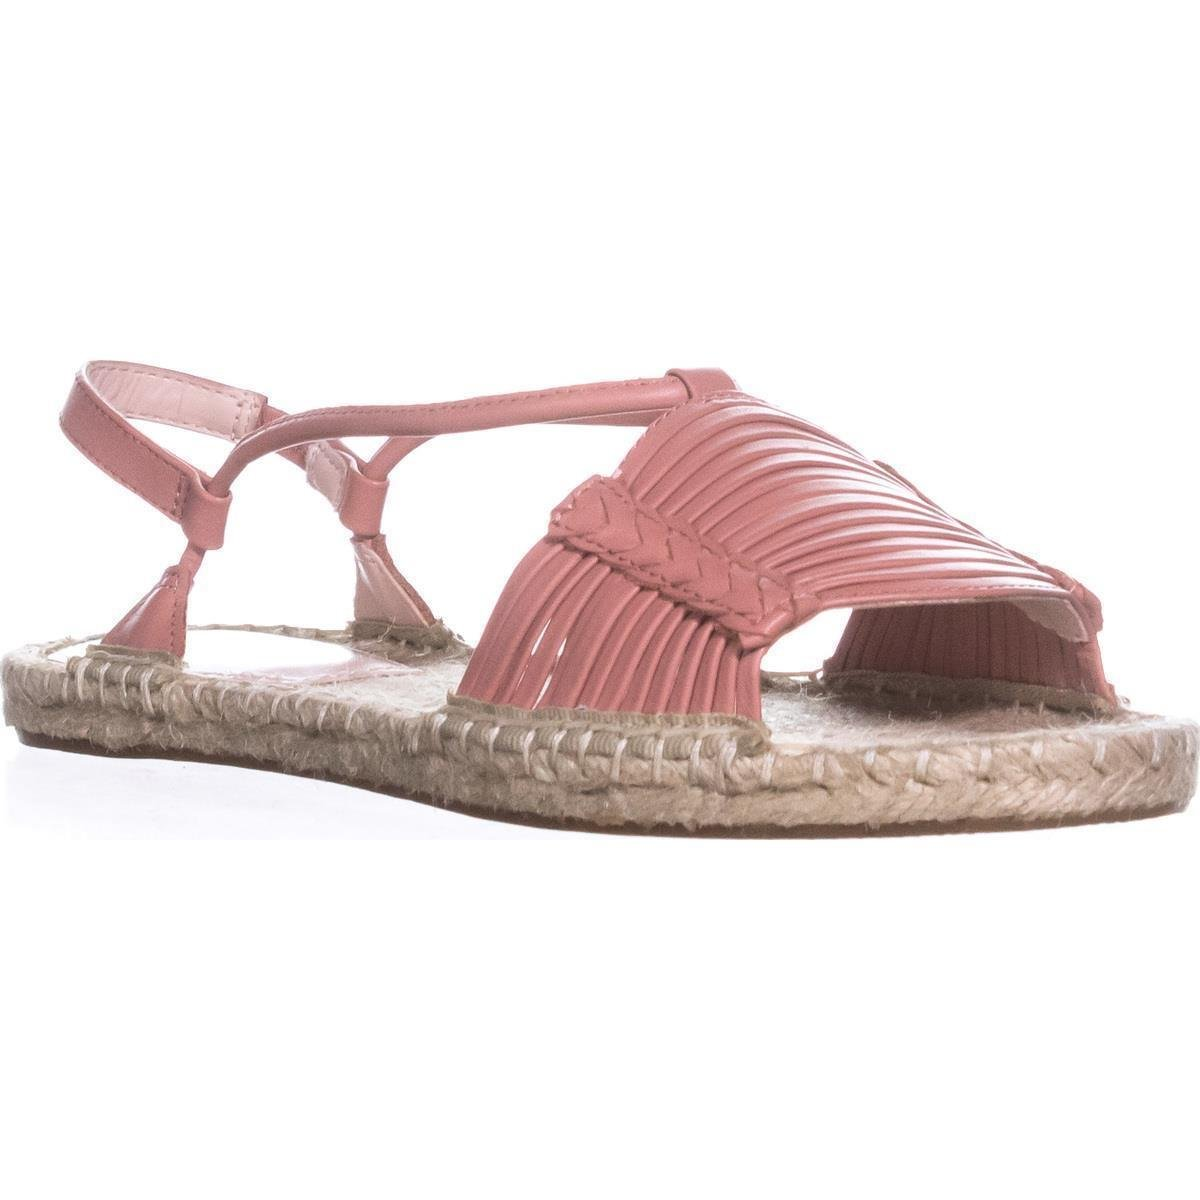 Avec Les Filles Womens Genevie Open Toe Casual Espadrille Sandals B07B43QS1V 11 M US|Coral Shiny Calf